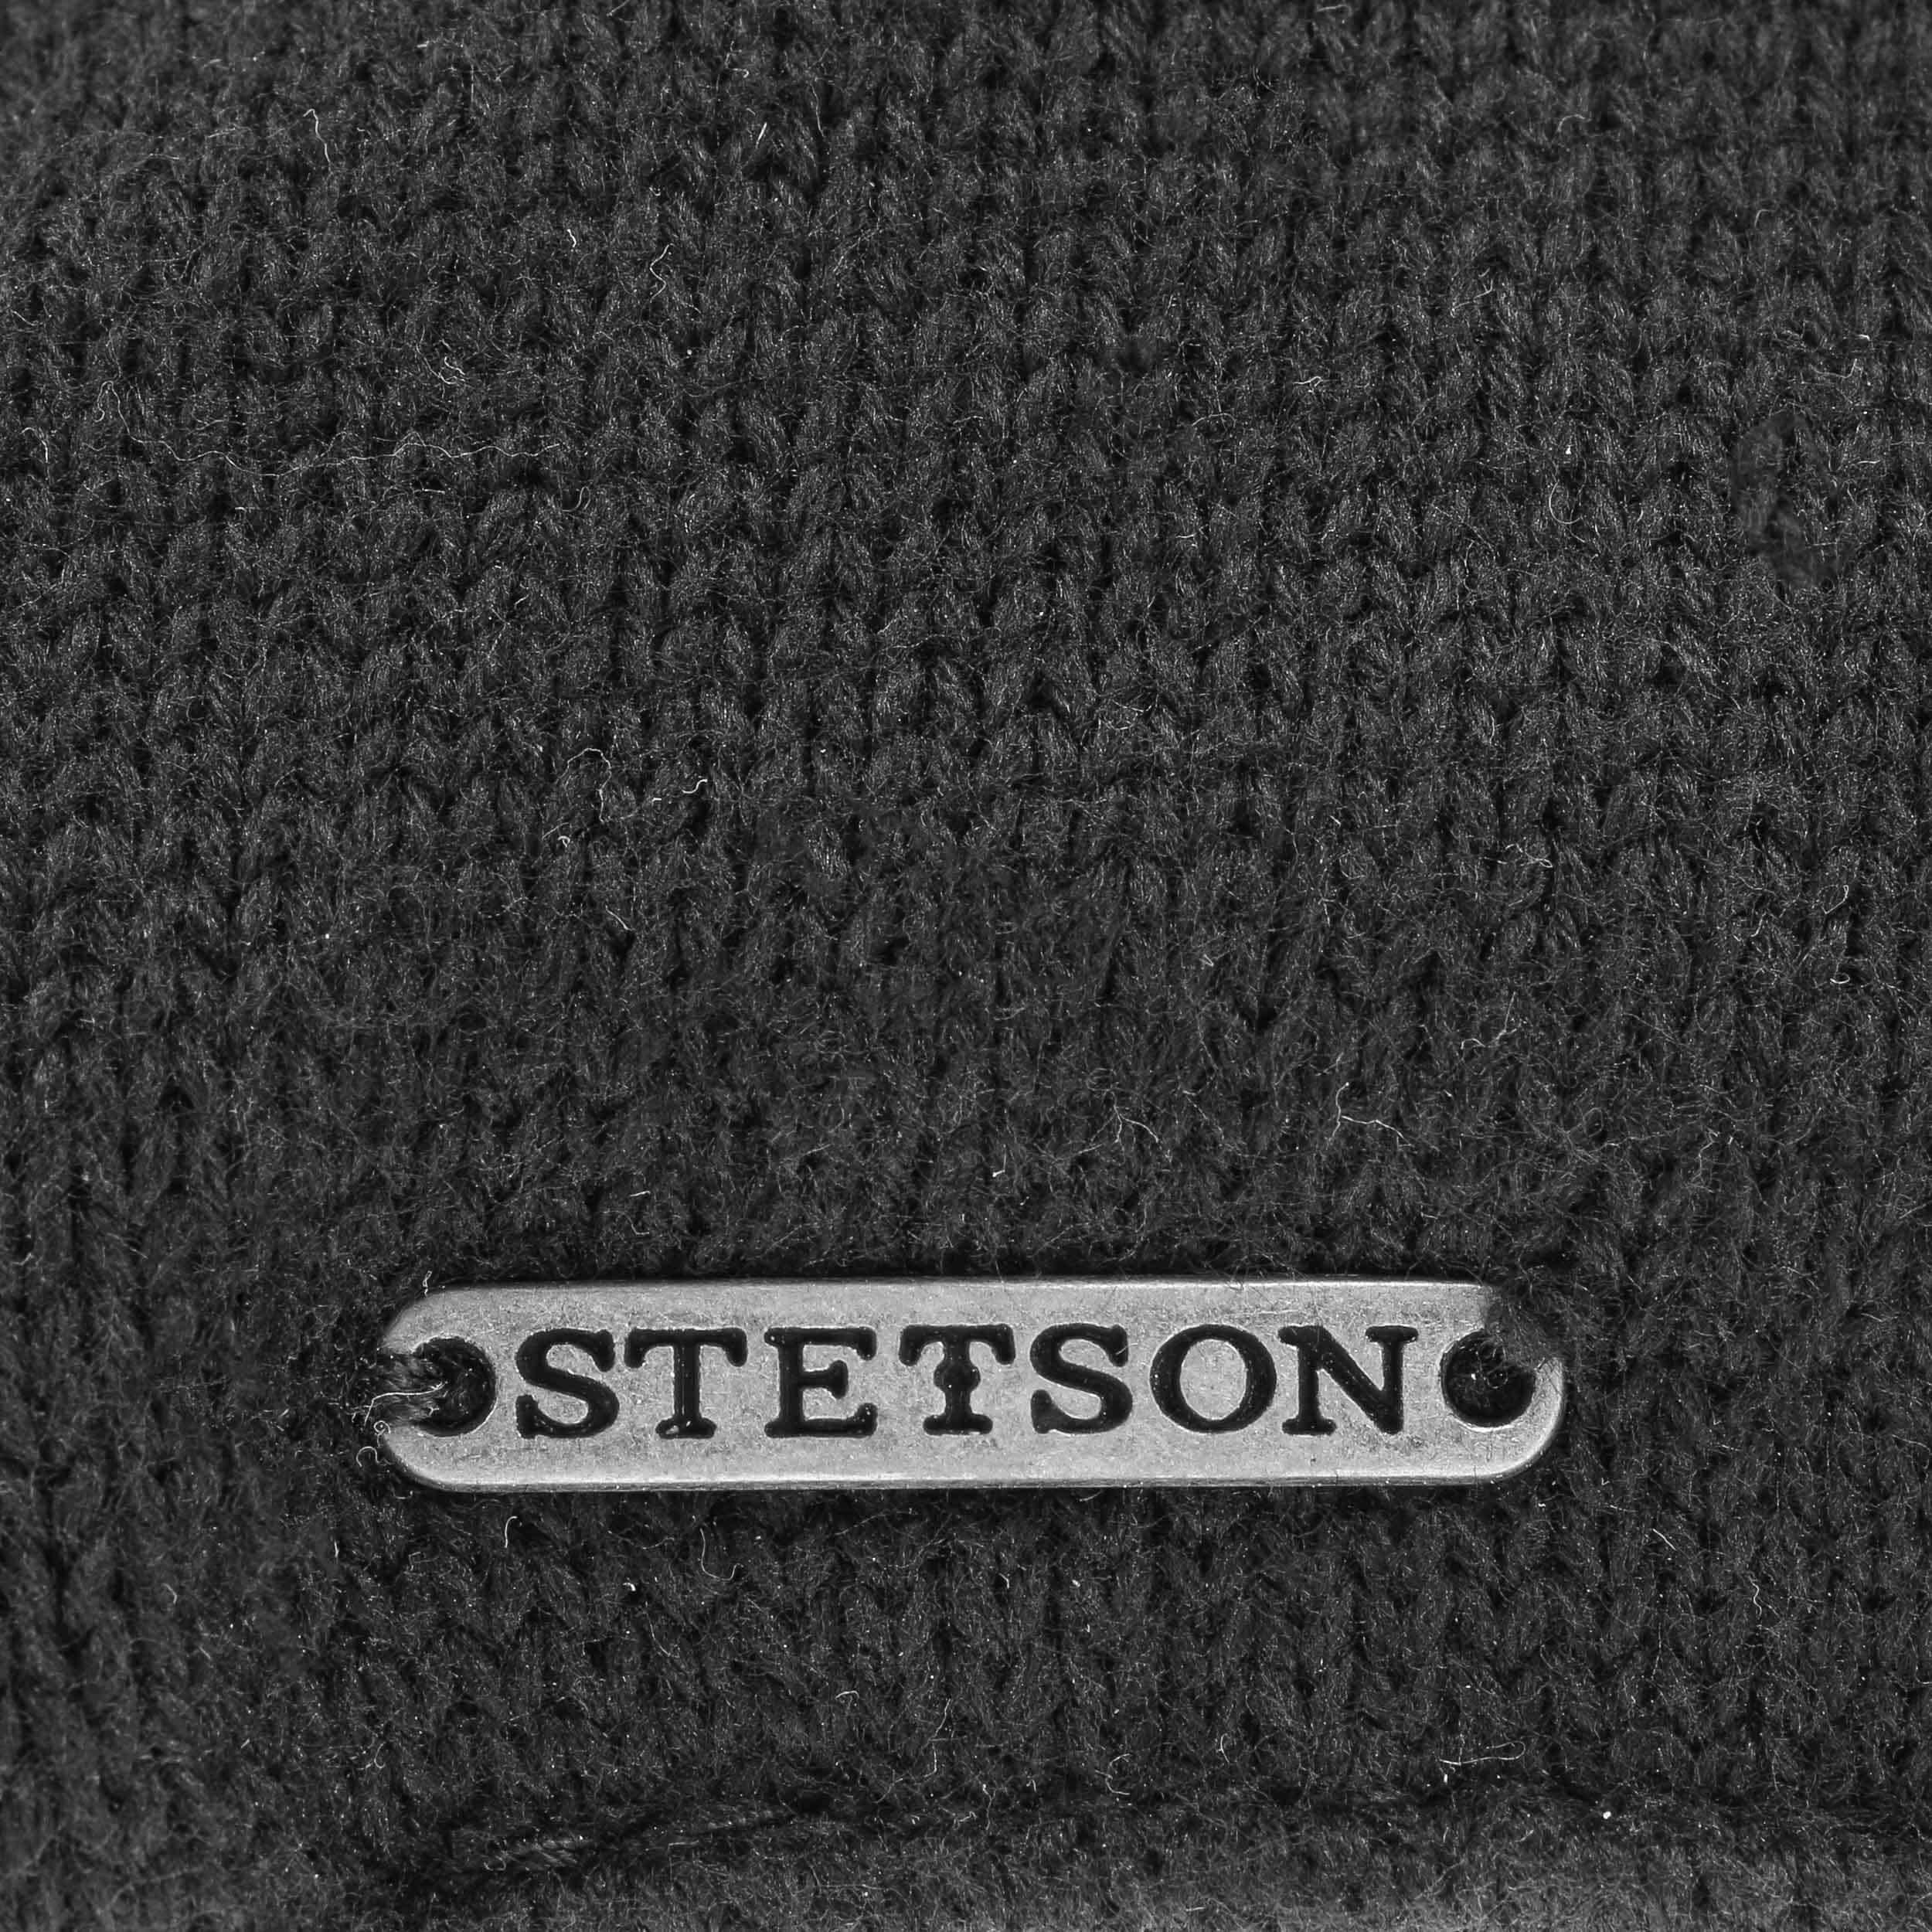 4f9fb74e06e9 Gorra Gatsby Muskegon by Stetson